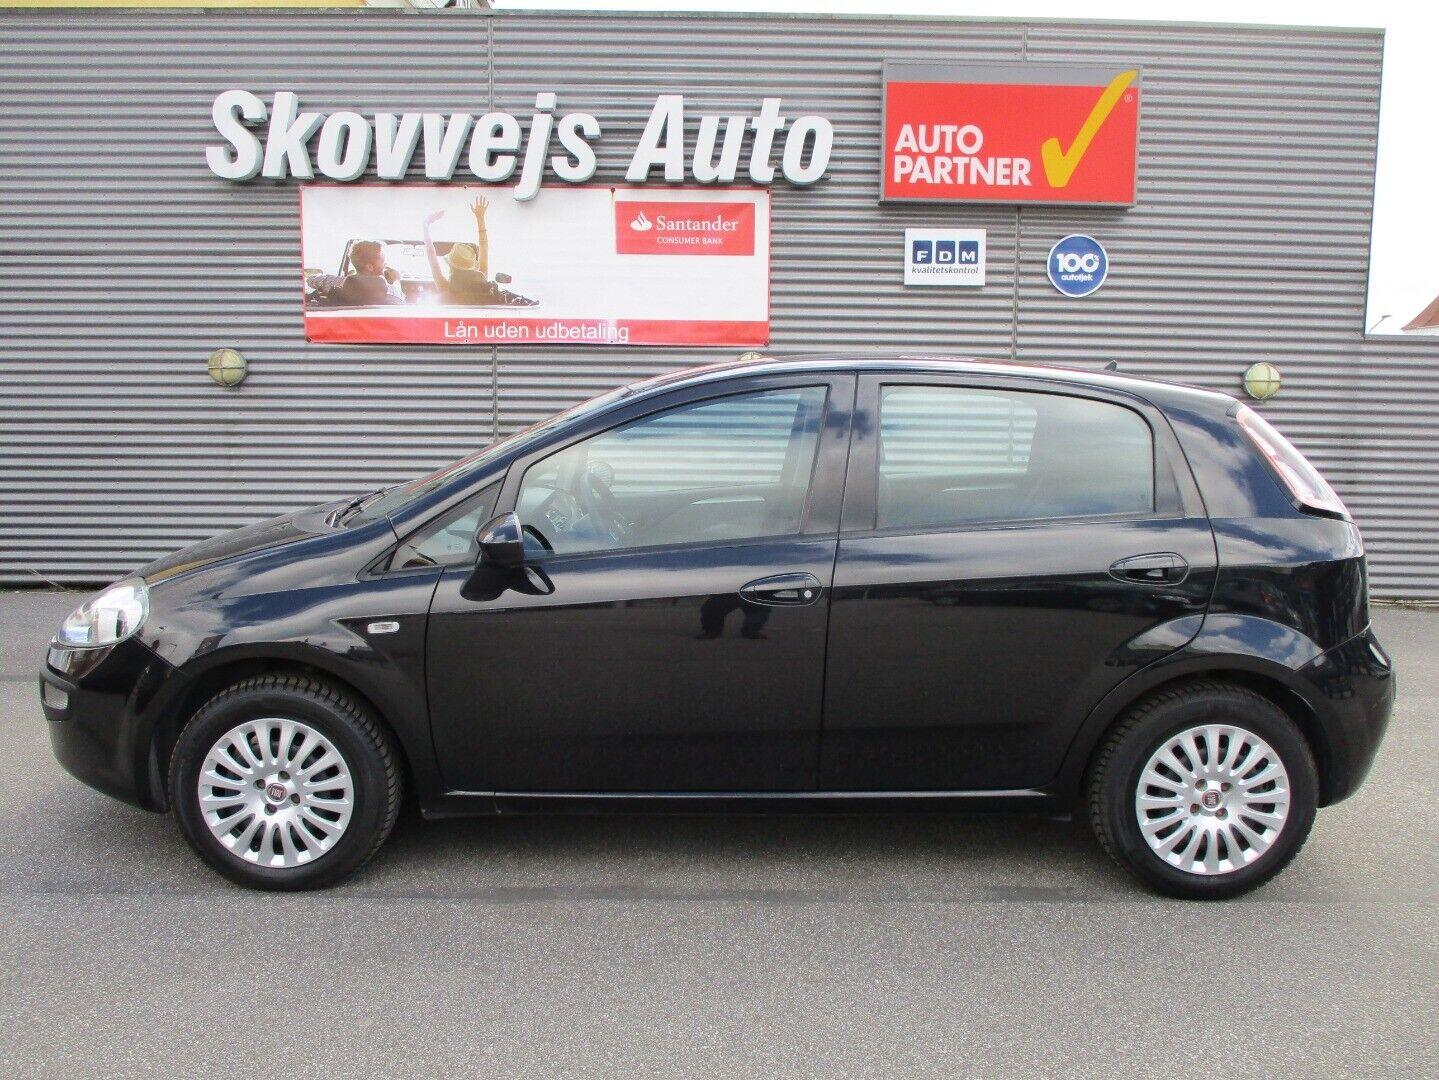 Fiat Punto Evo 1,4 Dynamic 5d - 44.900 kr.